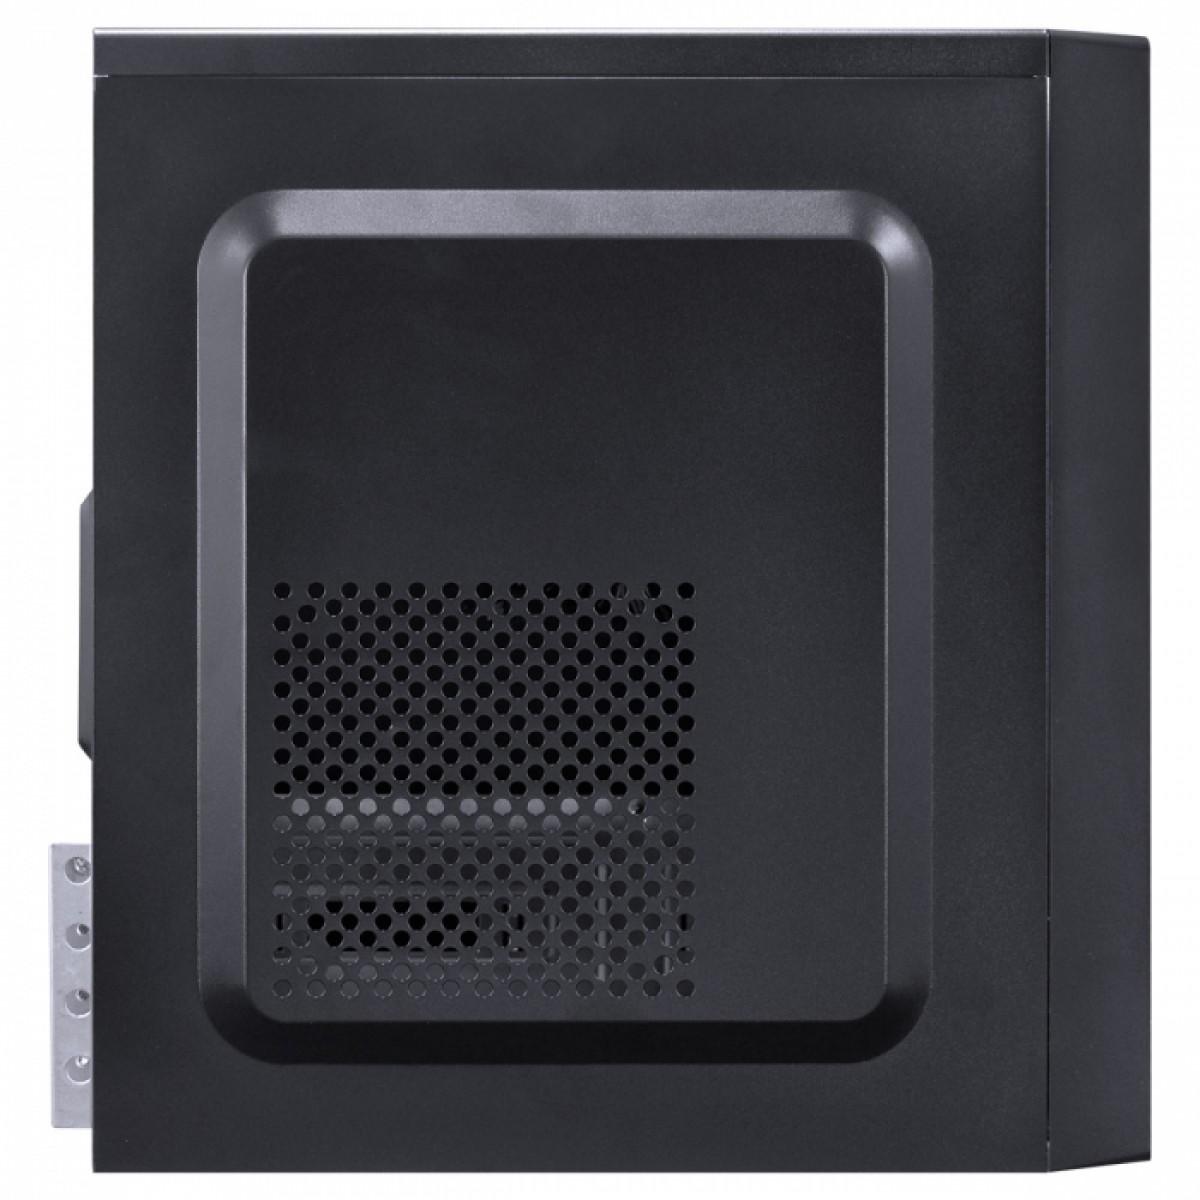 Computador Skul T-Moba Business B300 i3 9100 / 8GB DDR4 / SSD 480GB  / HDMI/VGA / FONTE 200W